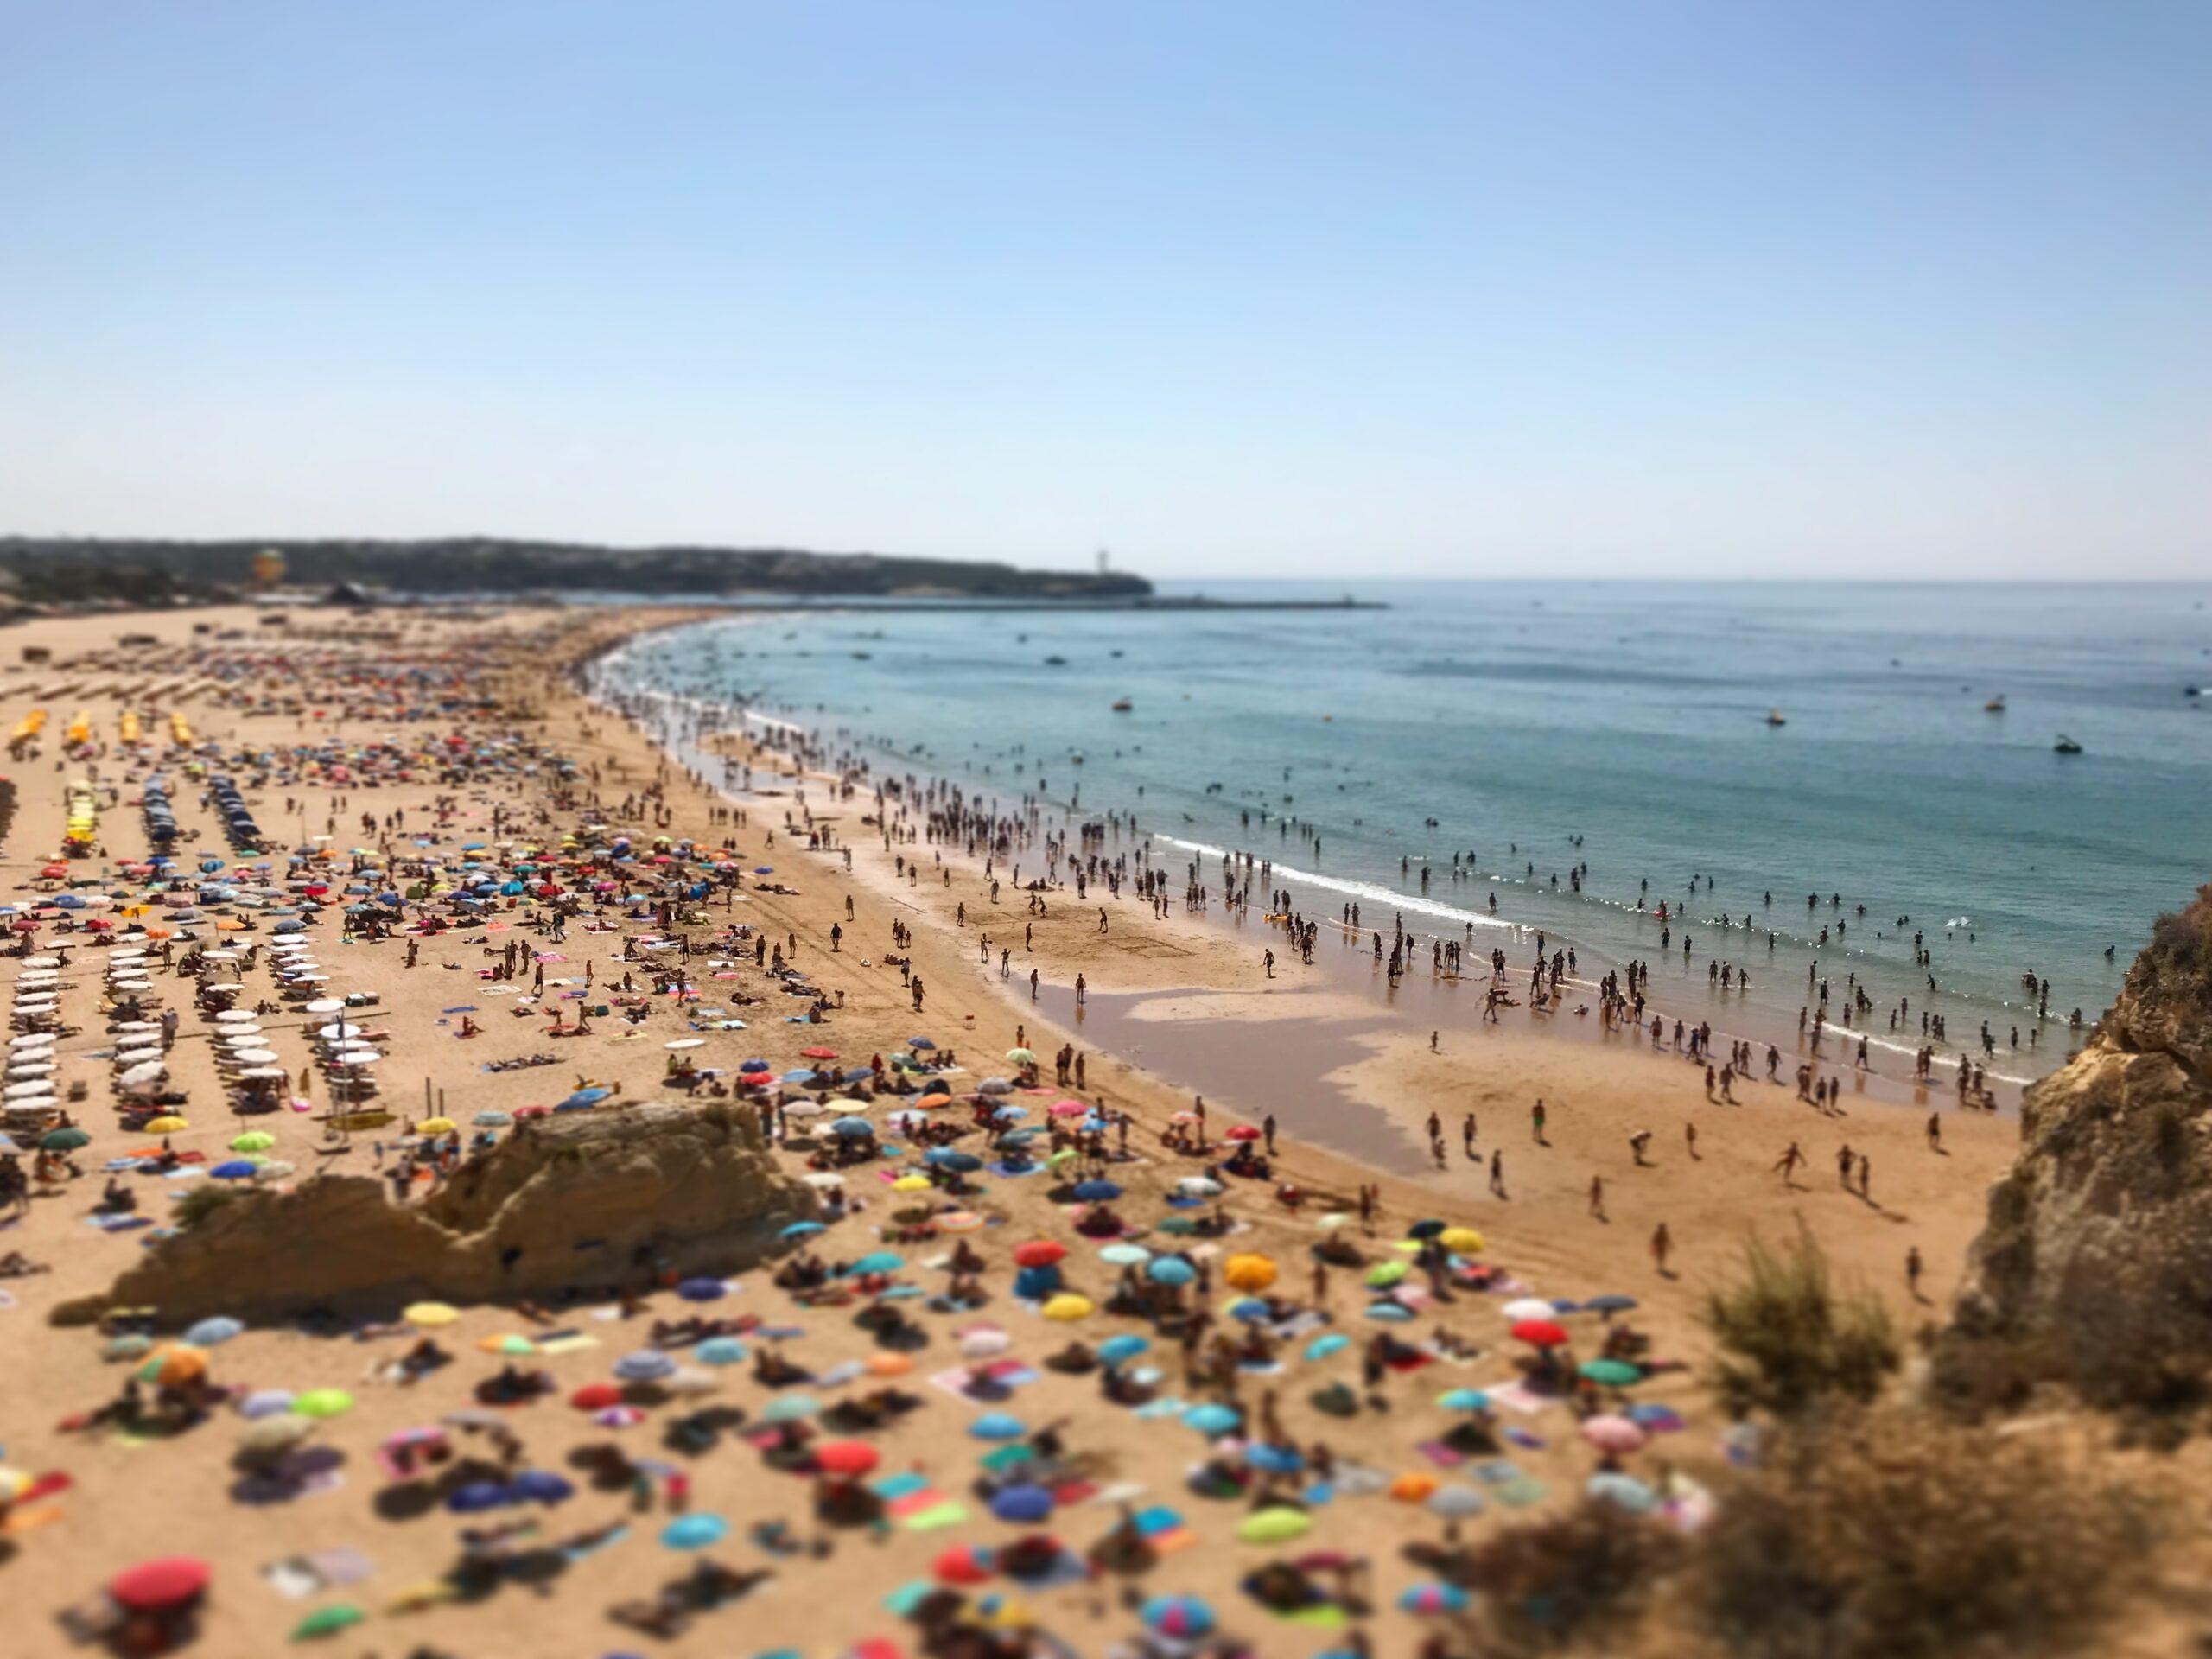 Massatoerisme - rebel against overtourism